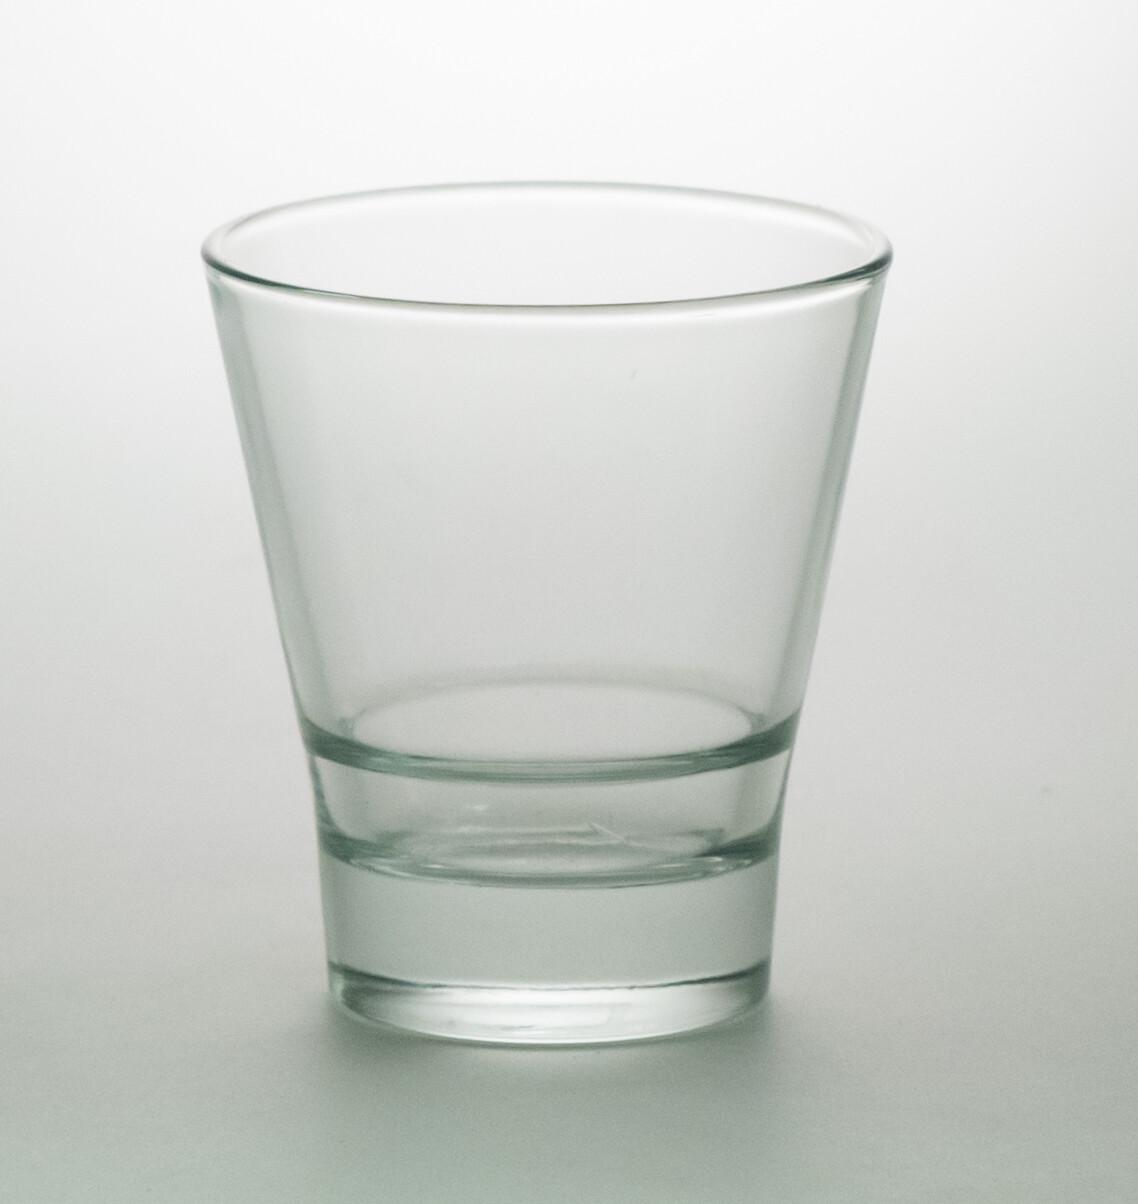 Vaso Roca Apilable 8 ¾ oz.